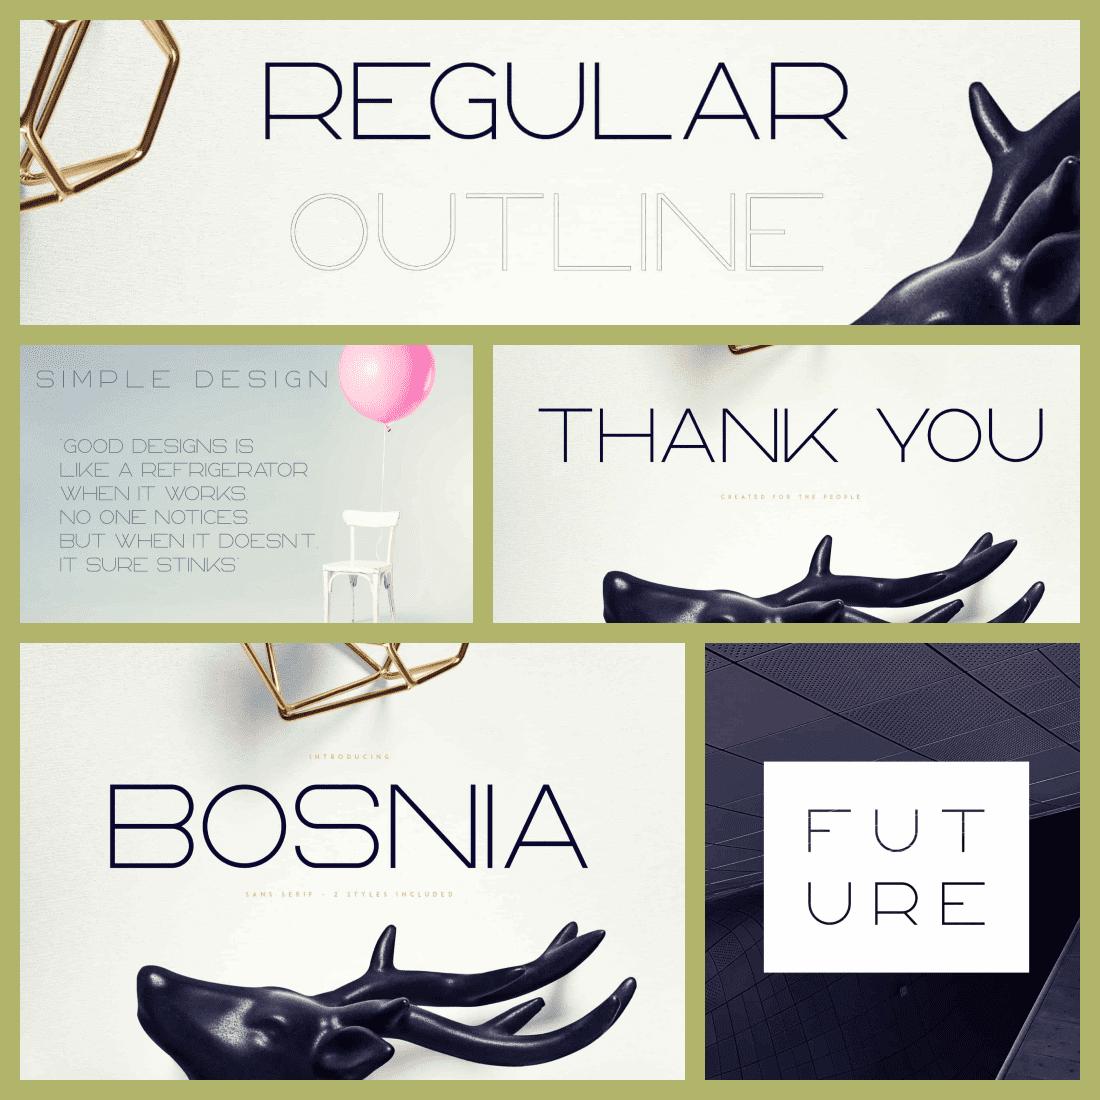 Rounded Sans Serif Font Bosnia